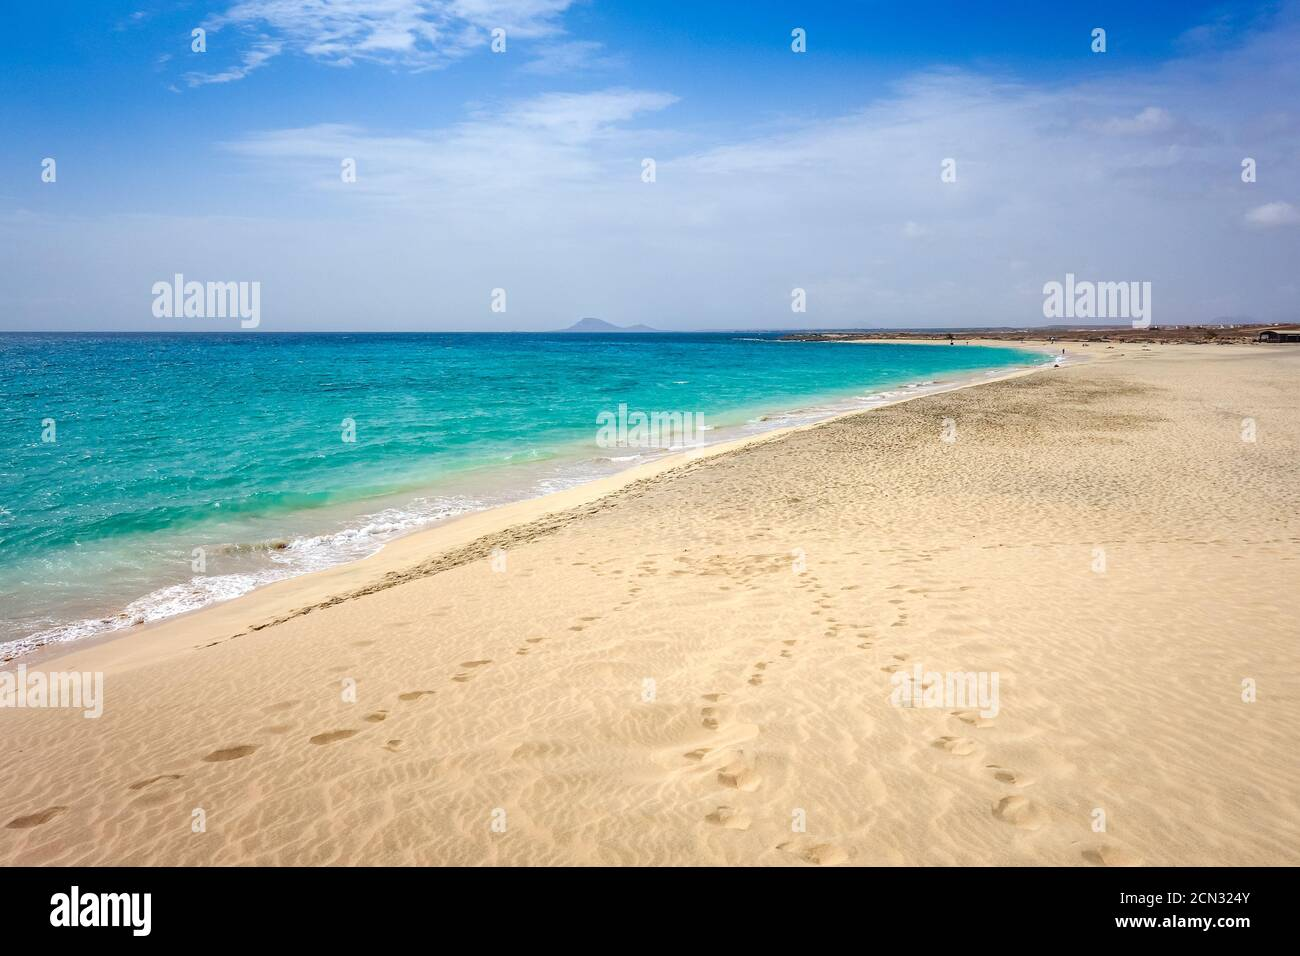 Ponta preta beach and dune in Santa Maria, Sal Island, Cape Verde Stock Photo